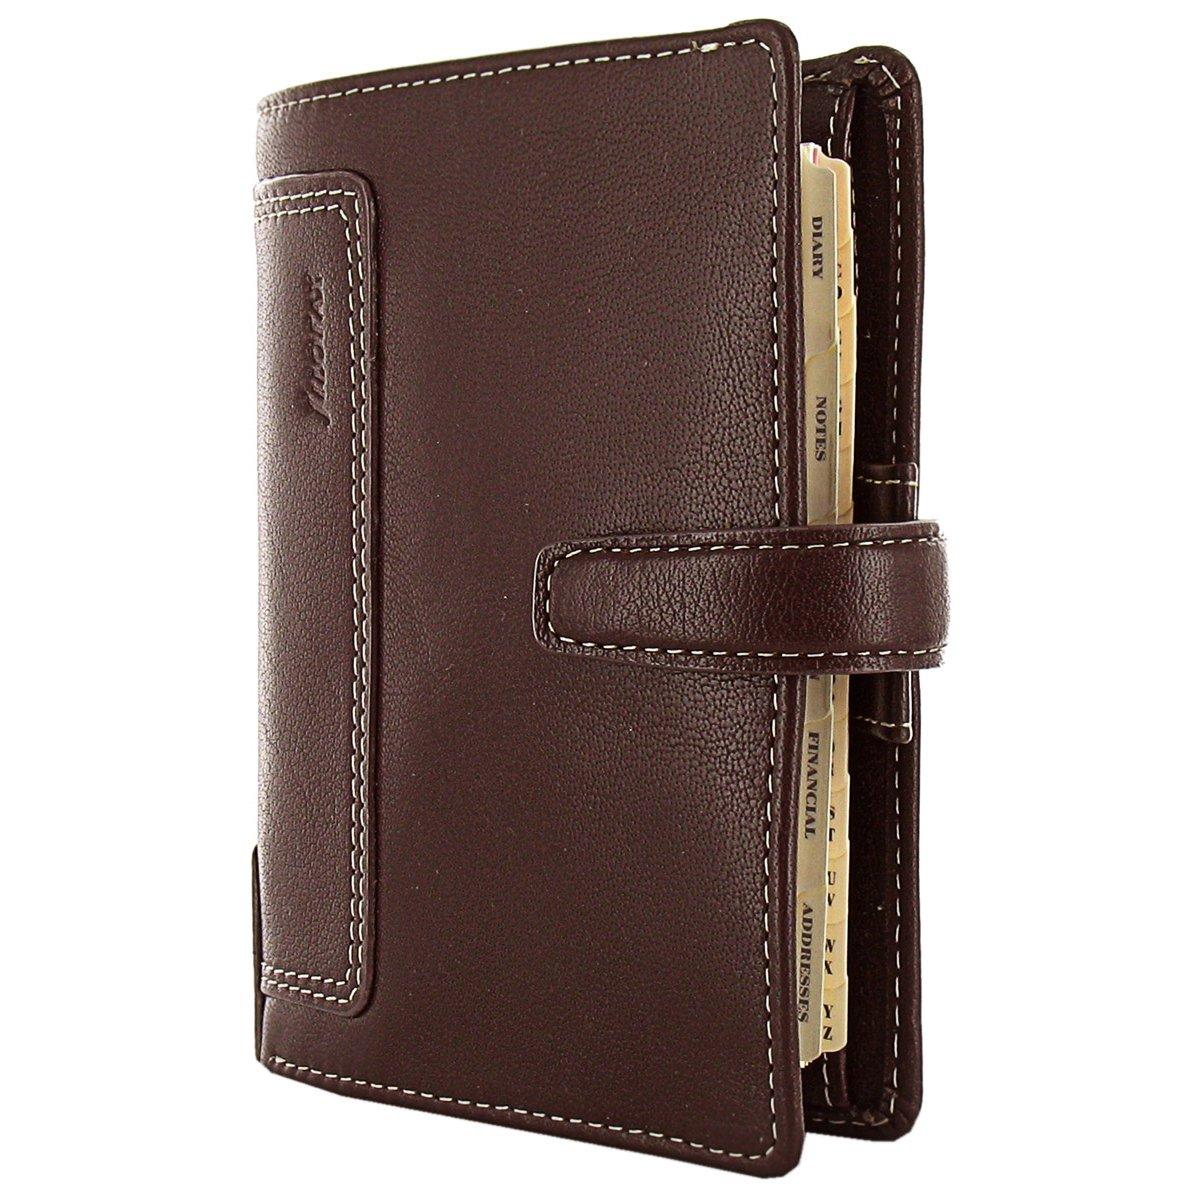 Filofax Holborn Pocket Leather Organizer Brown (025119)